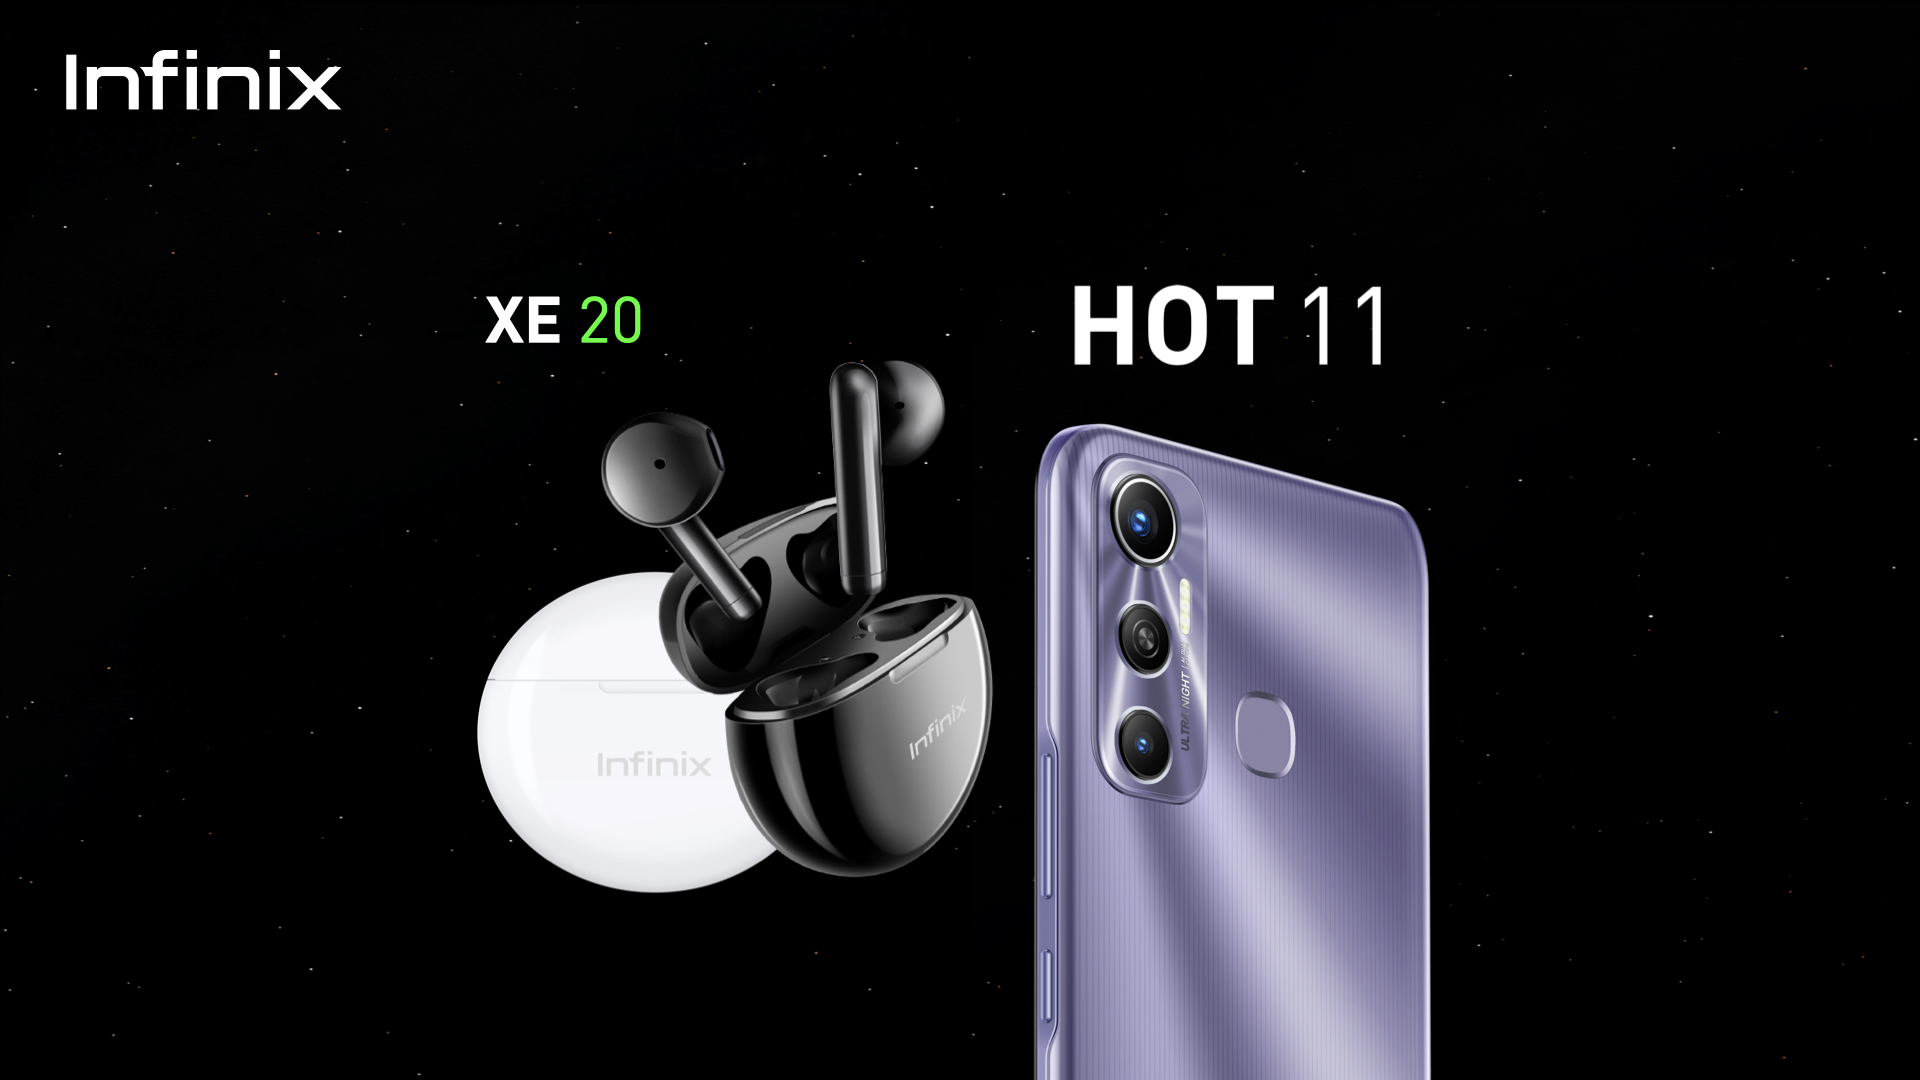 Infinix Hot 11 dan TWS XE20